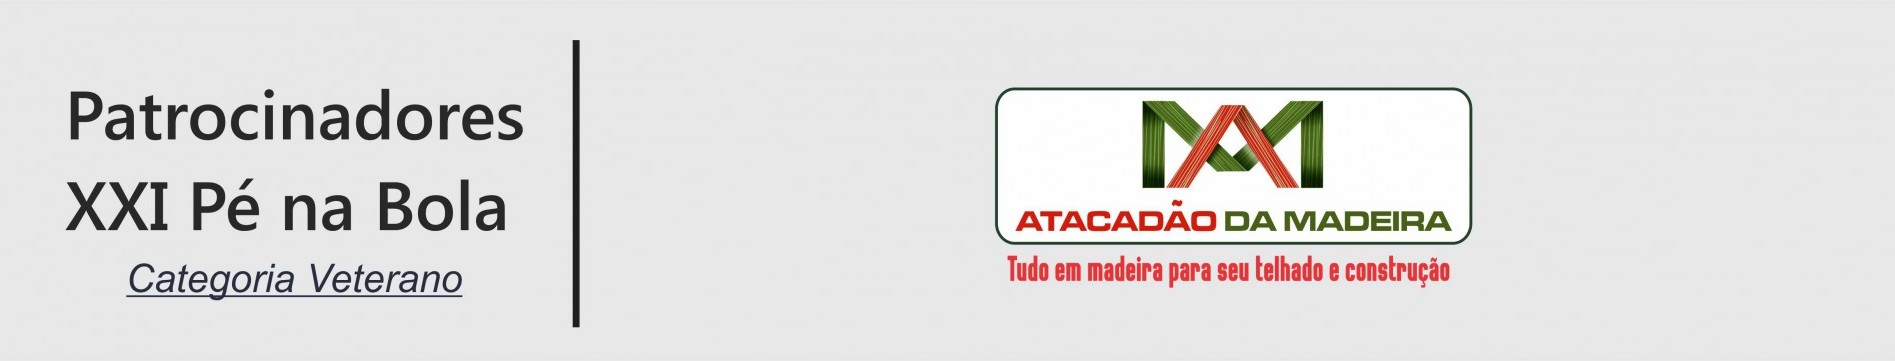 uploads/multimidia/20180620014153-atacadao.jpg